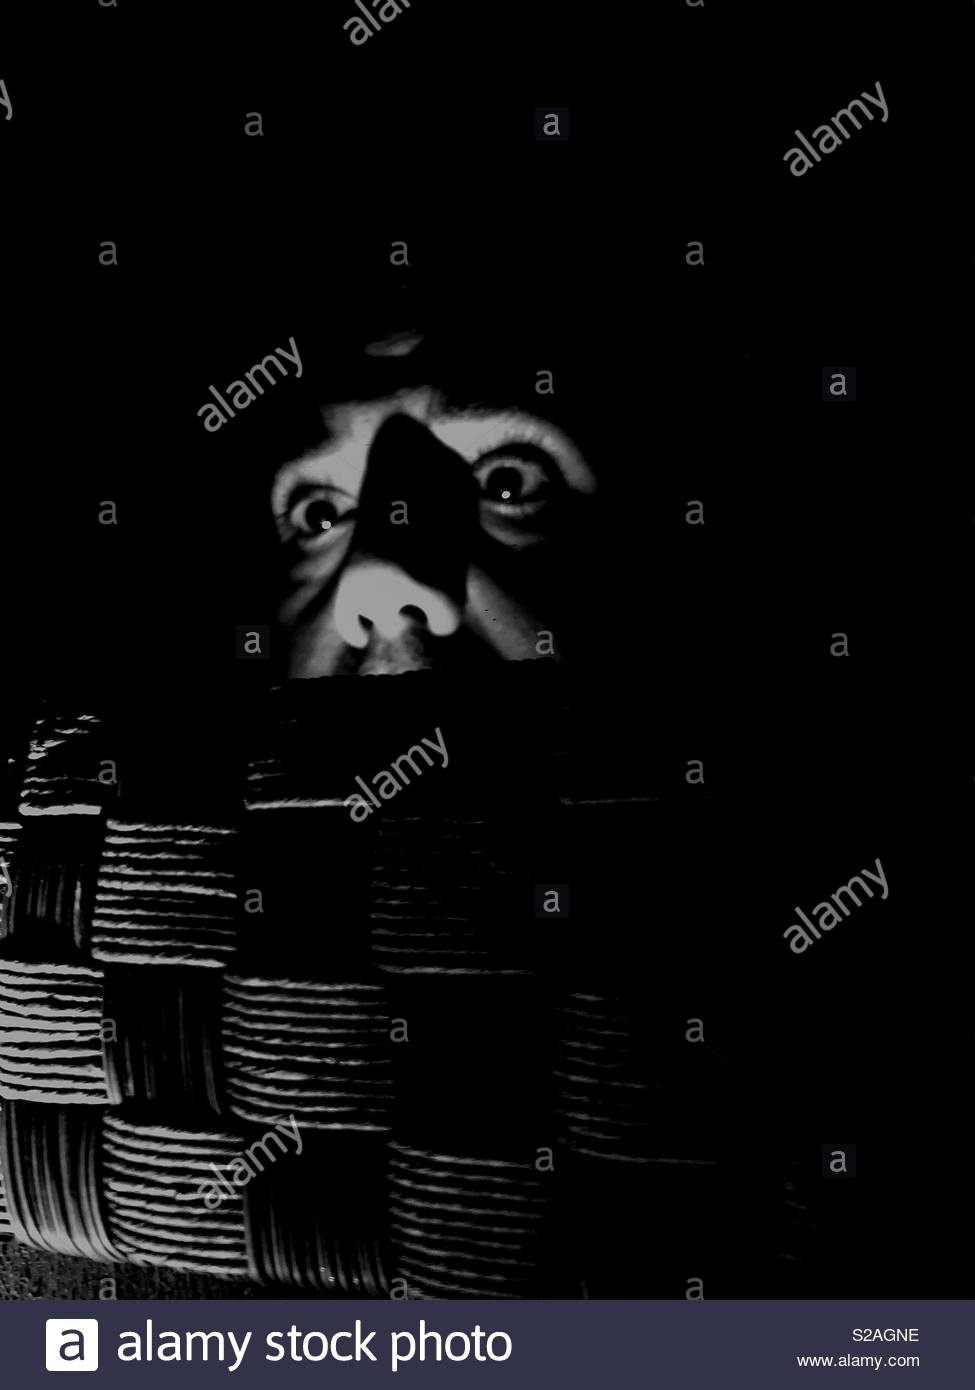 Insomnia - Stock Image